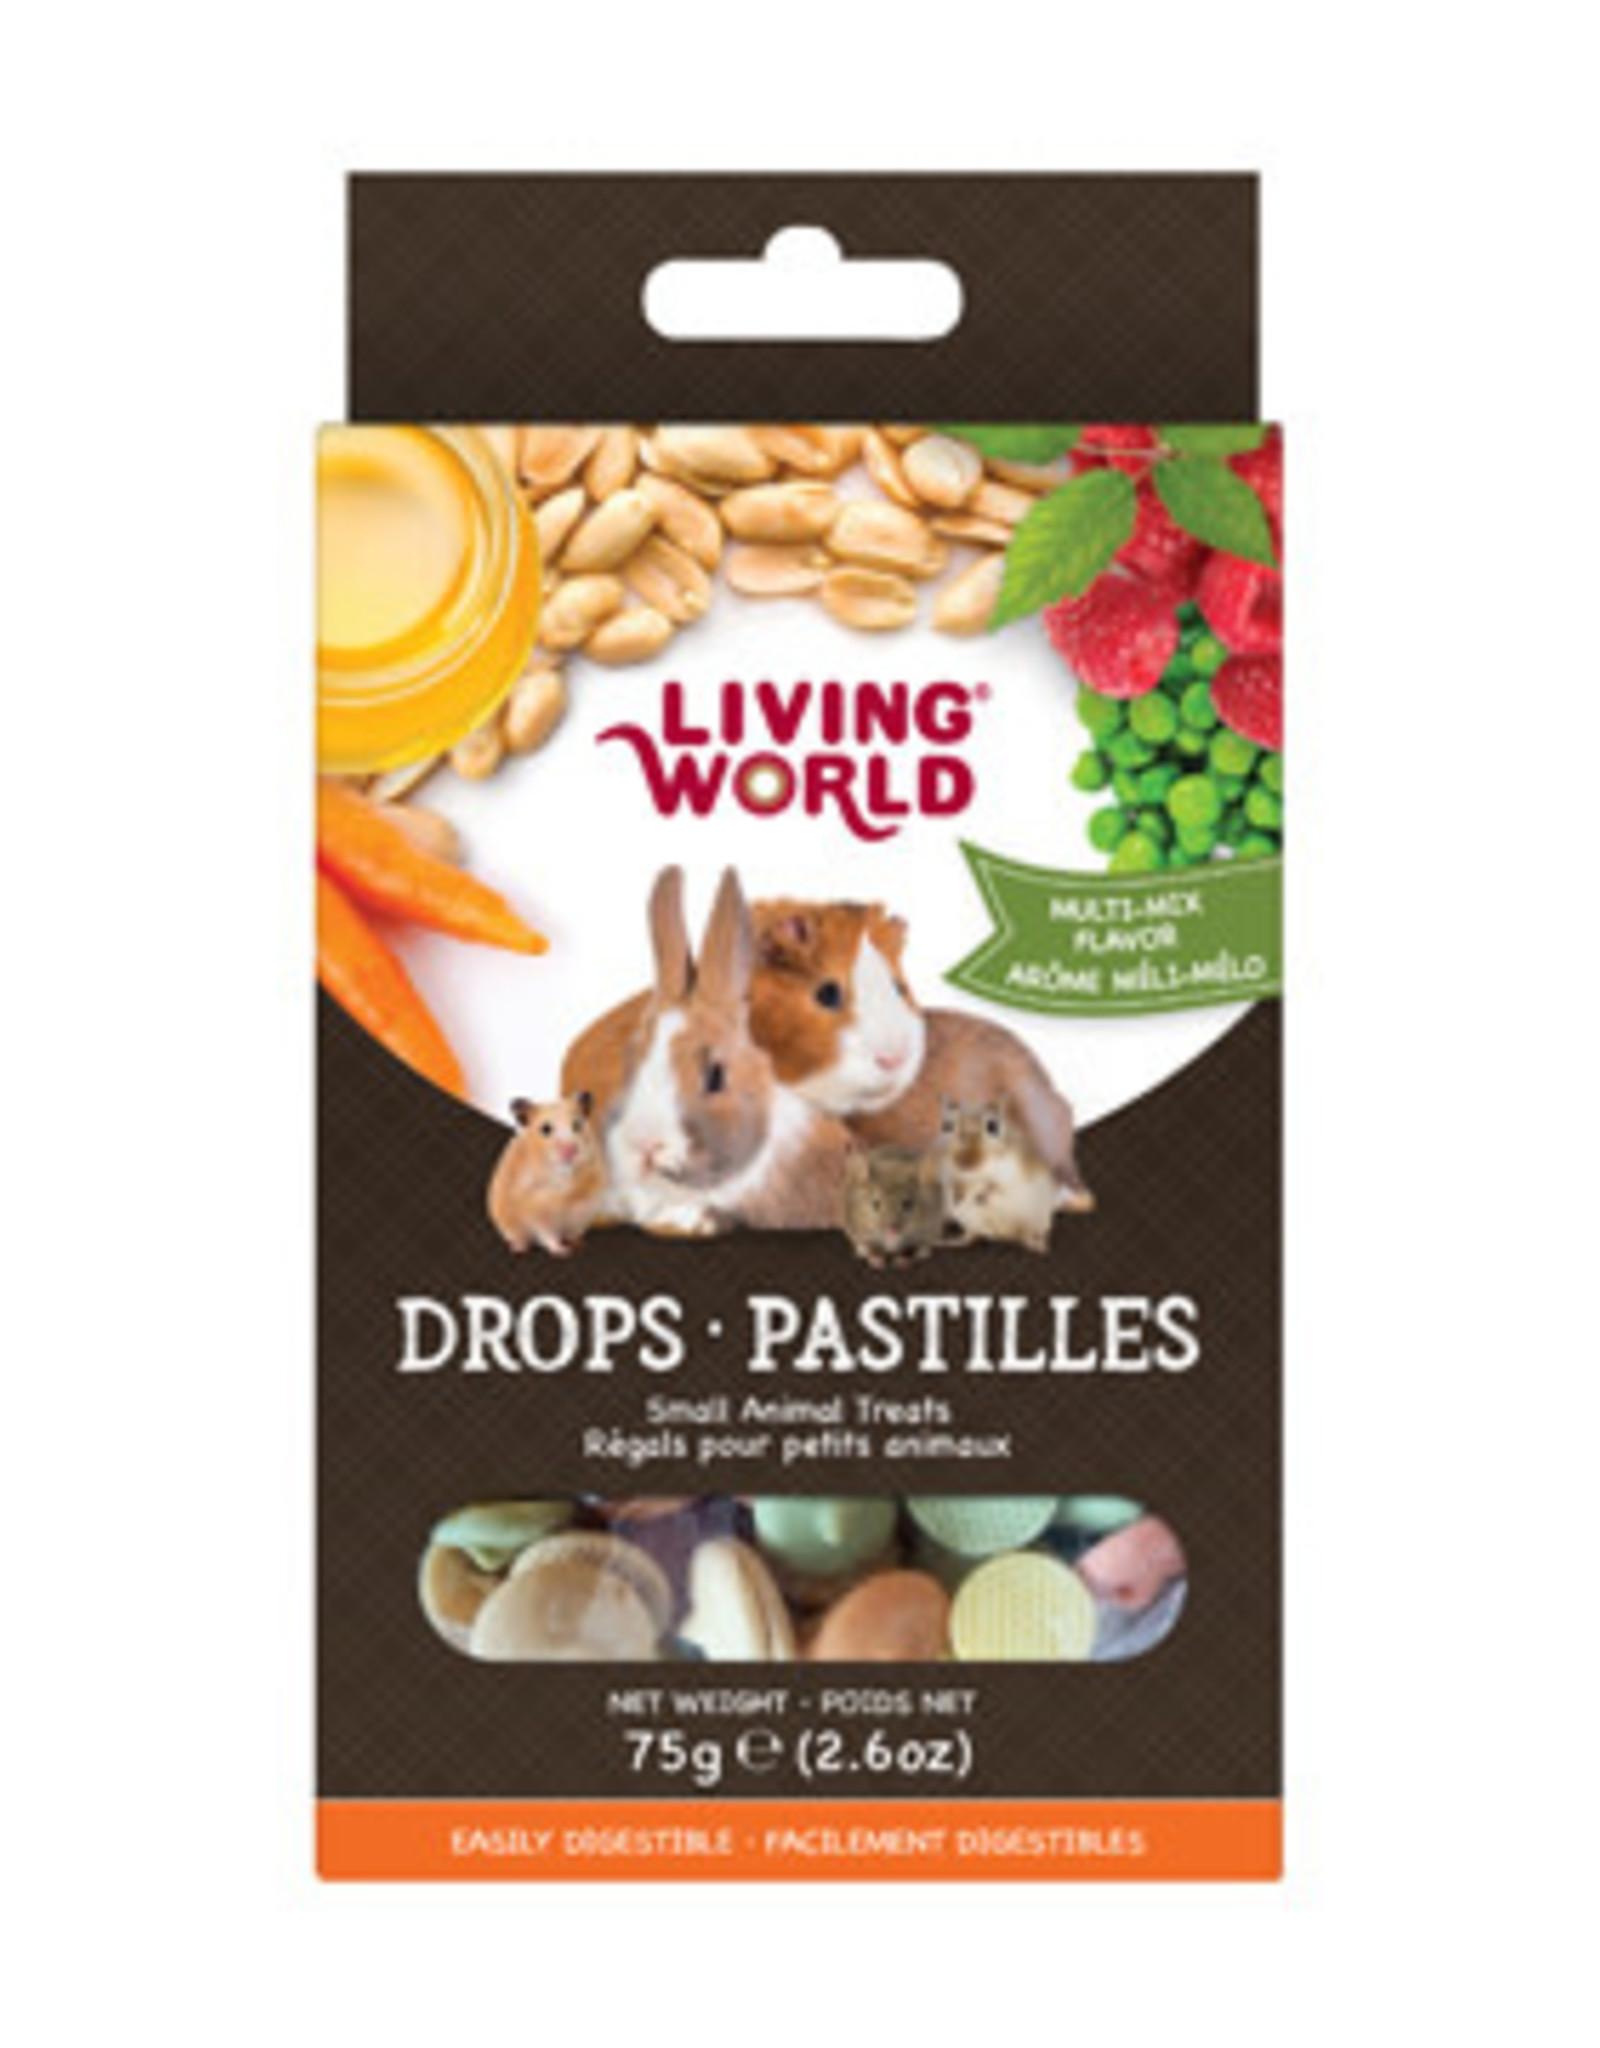 LIVING WORLD Living World Small Animal Drops - Multi-Mix Flavour - 75 g (2.6 oz)